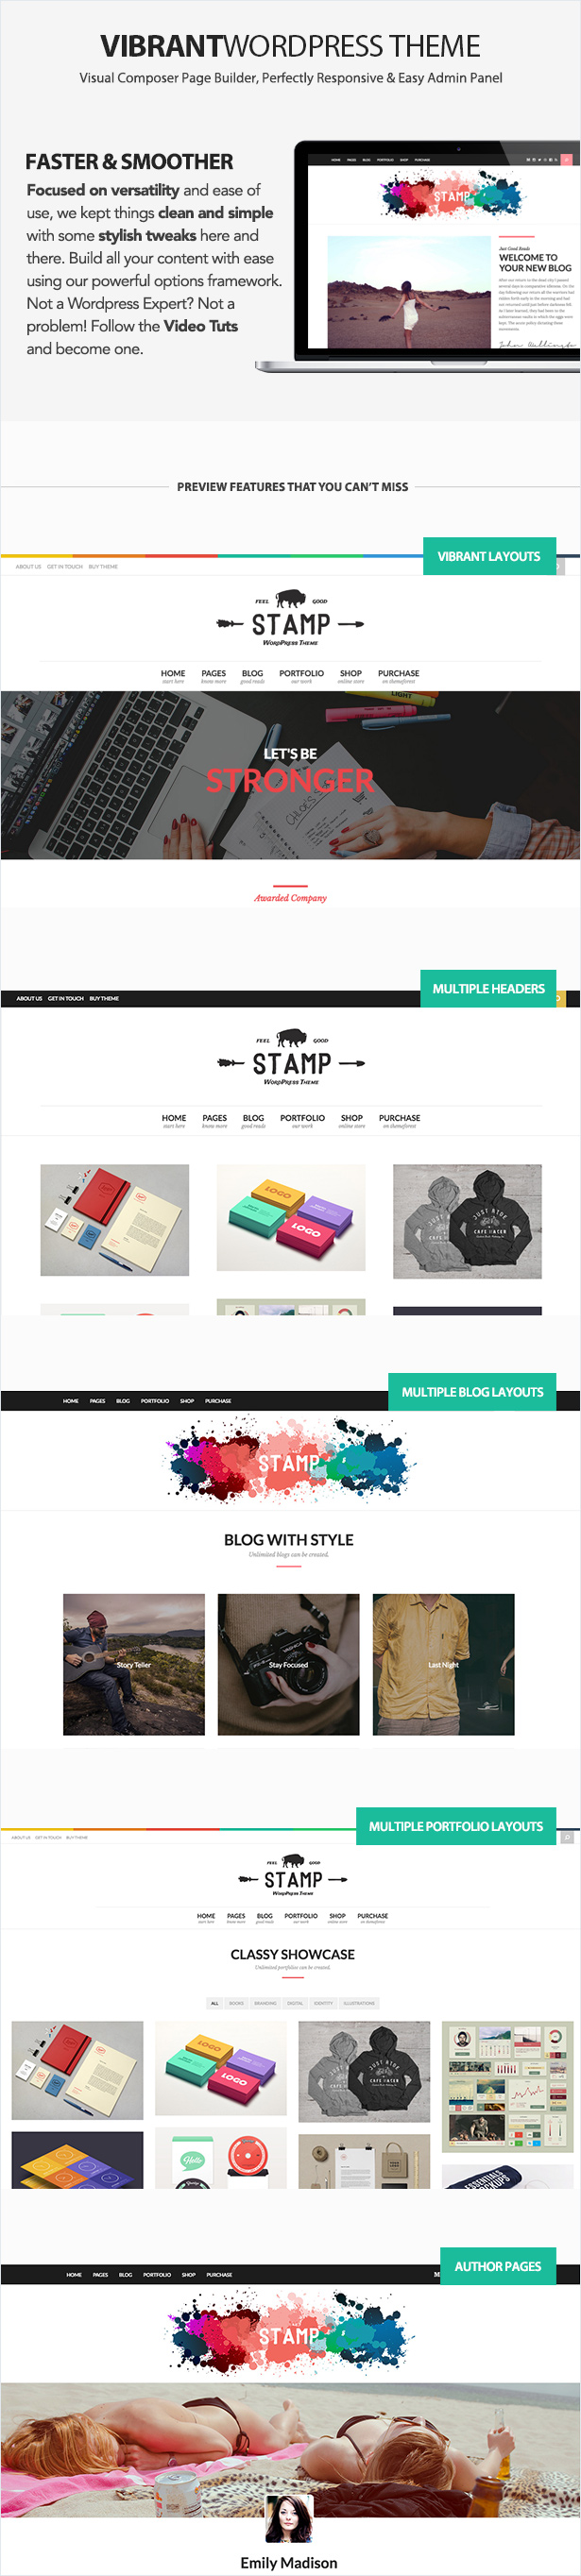 Stamp - Vibrant WordPress Theme - 2